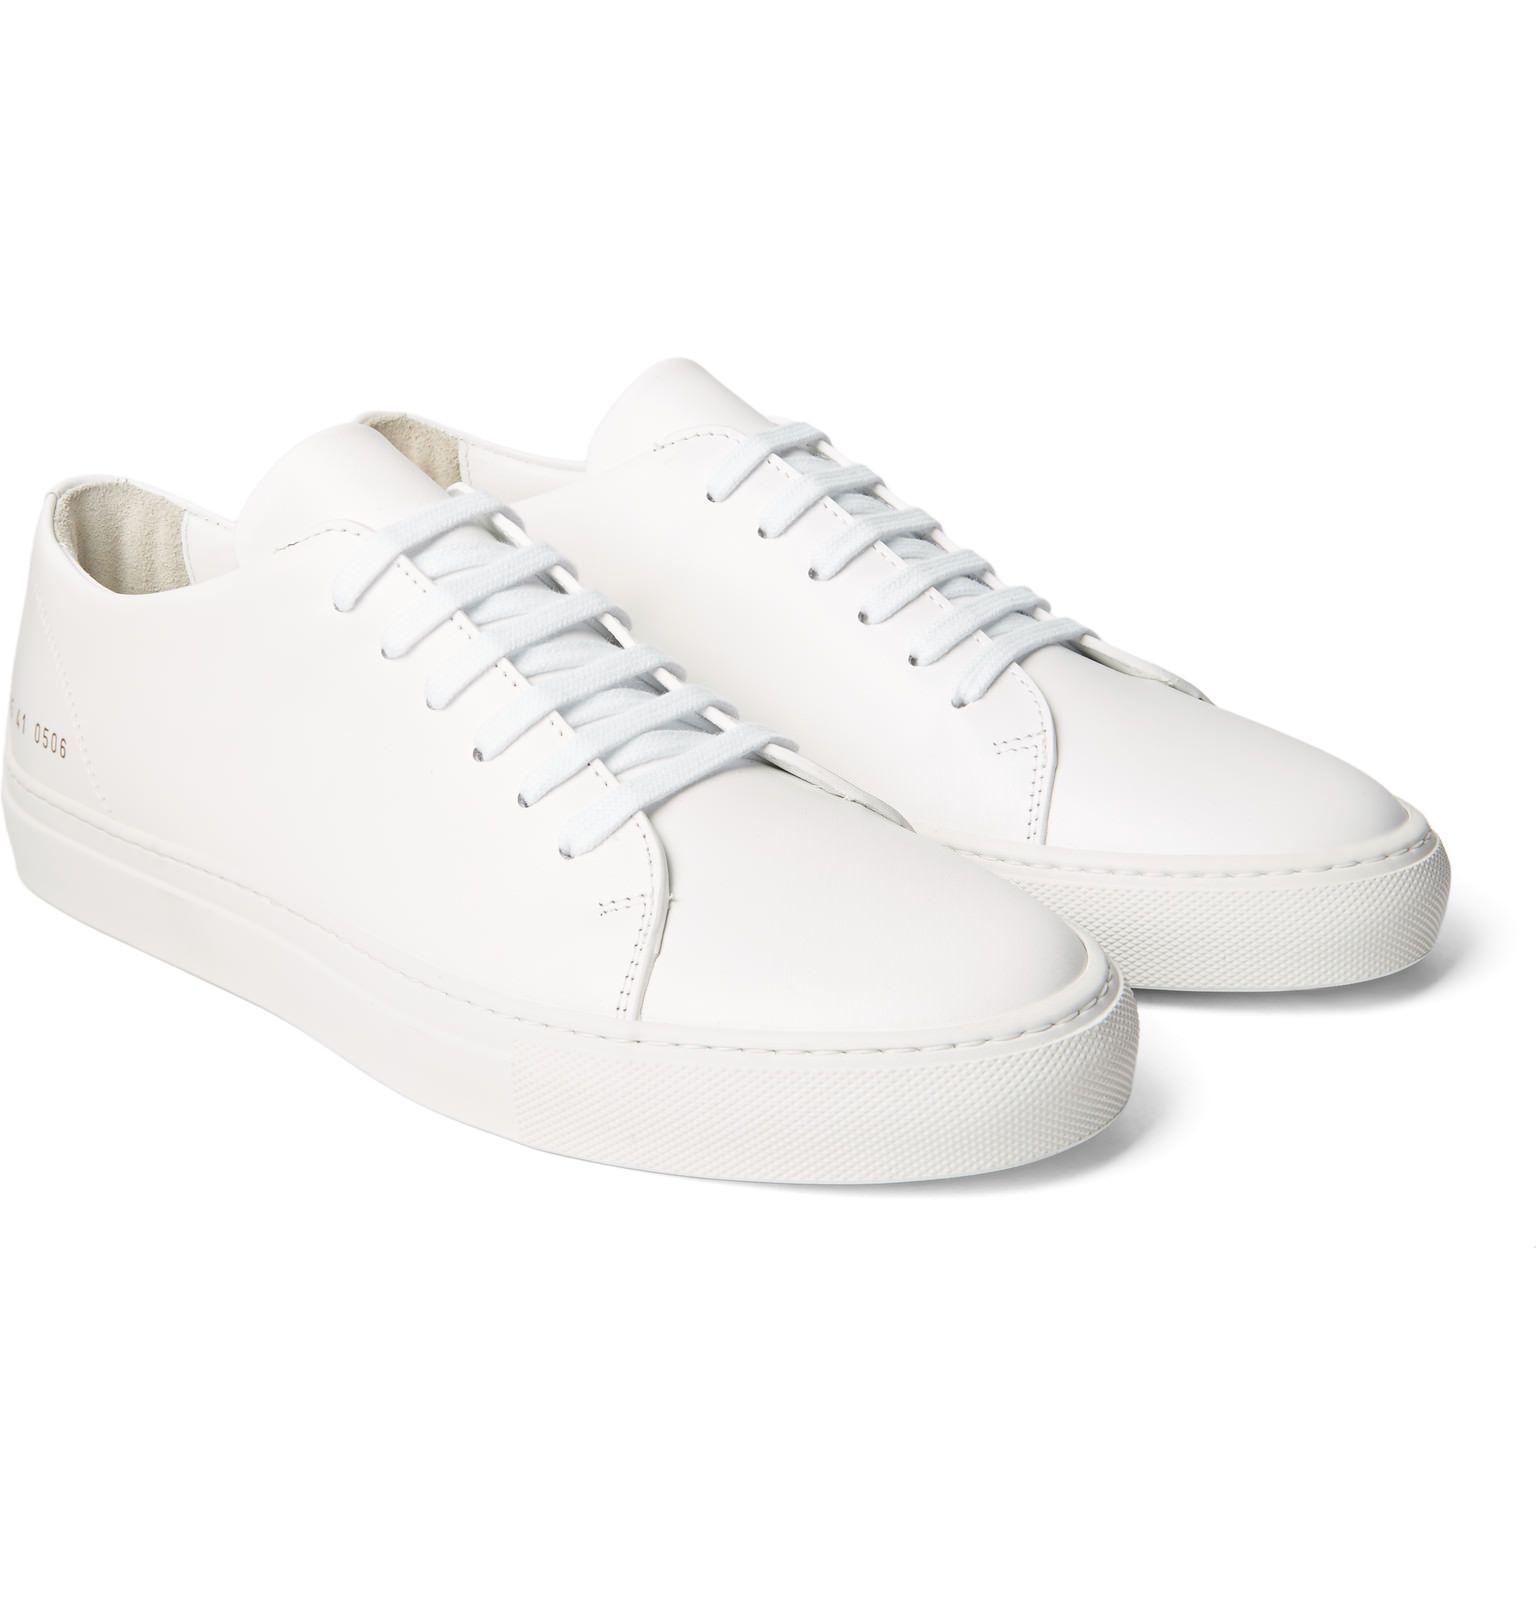 COMMON PROJECTSDesigner Shoes, Leather Achilles Super Men's Sneakers